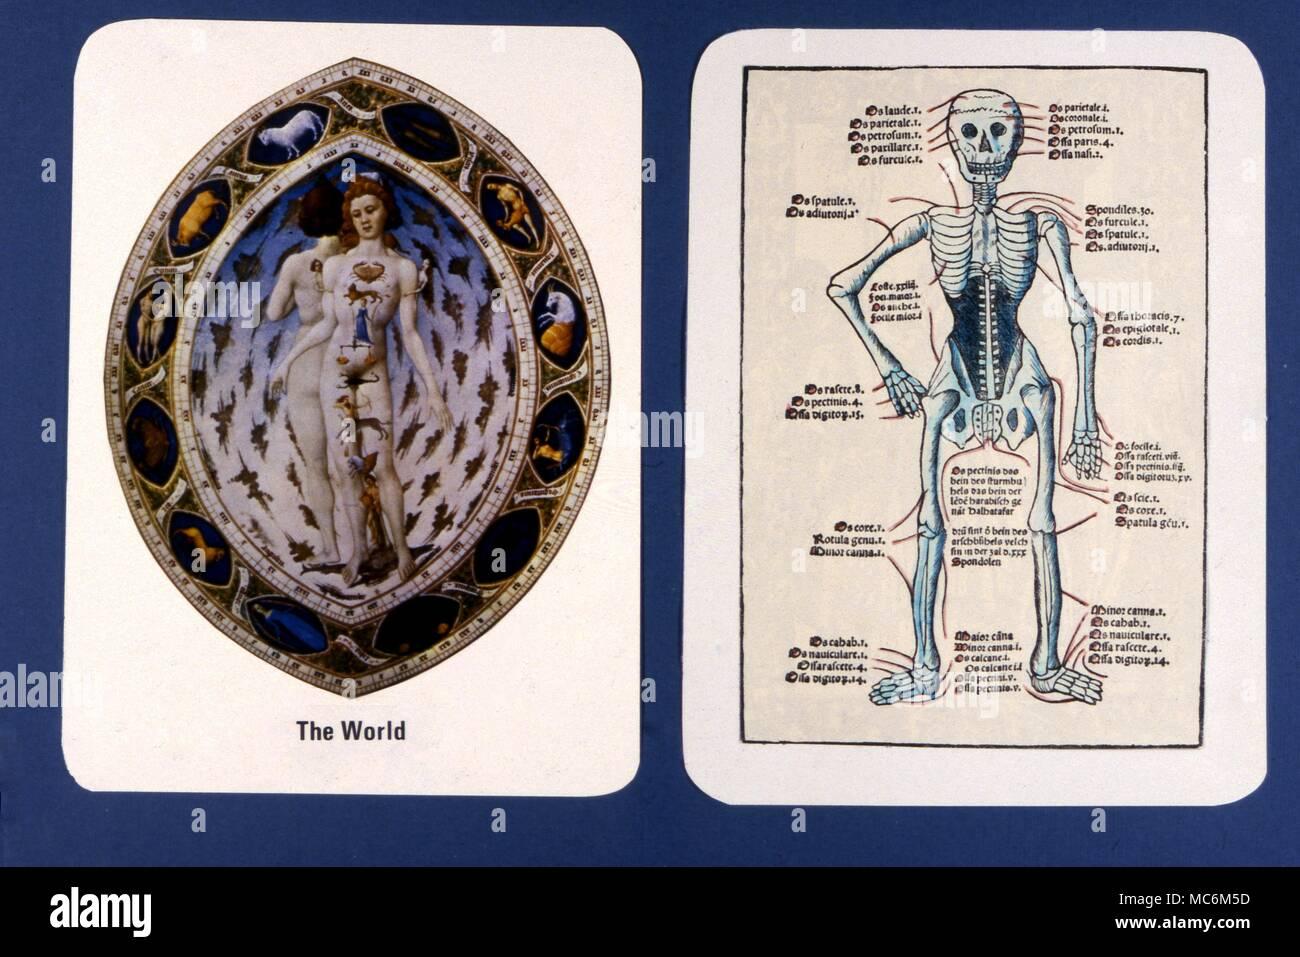 Tarot Cards - Major Arcana - Private Design In Modern times